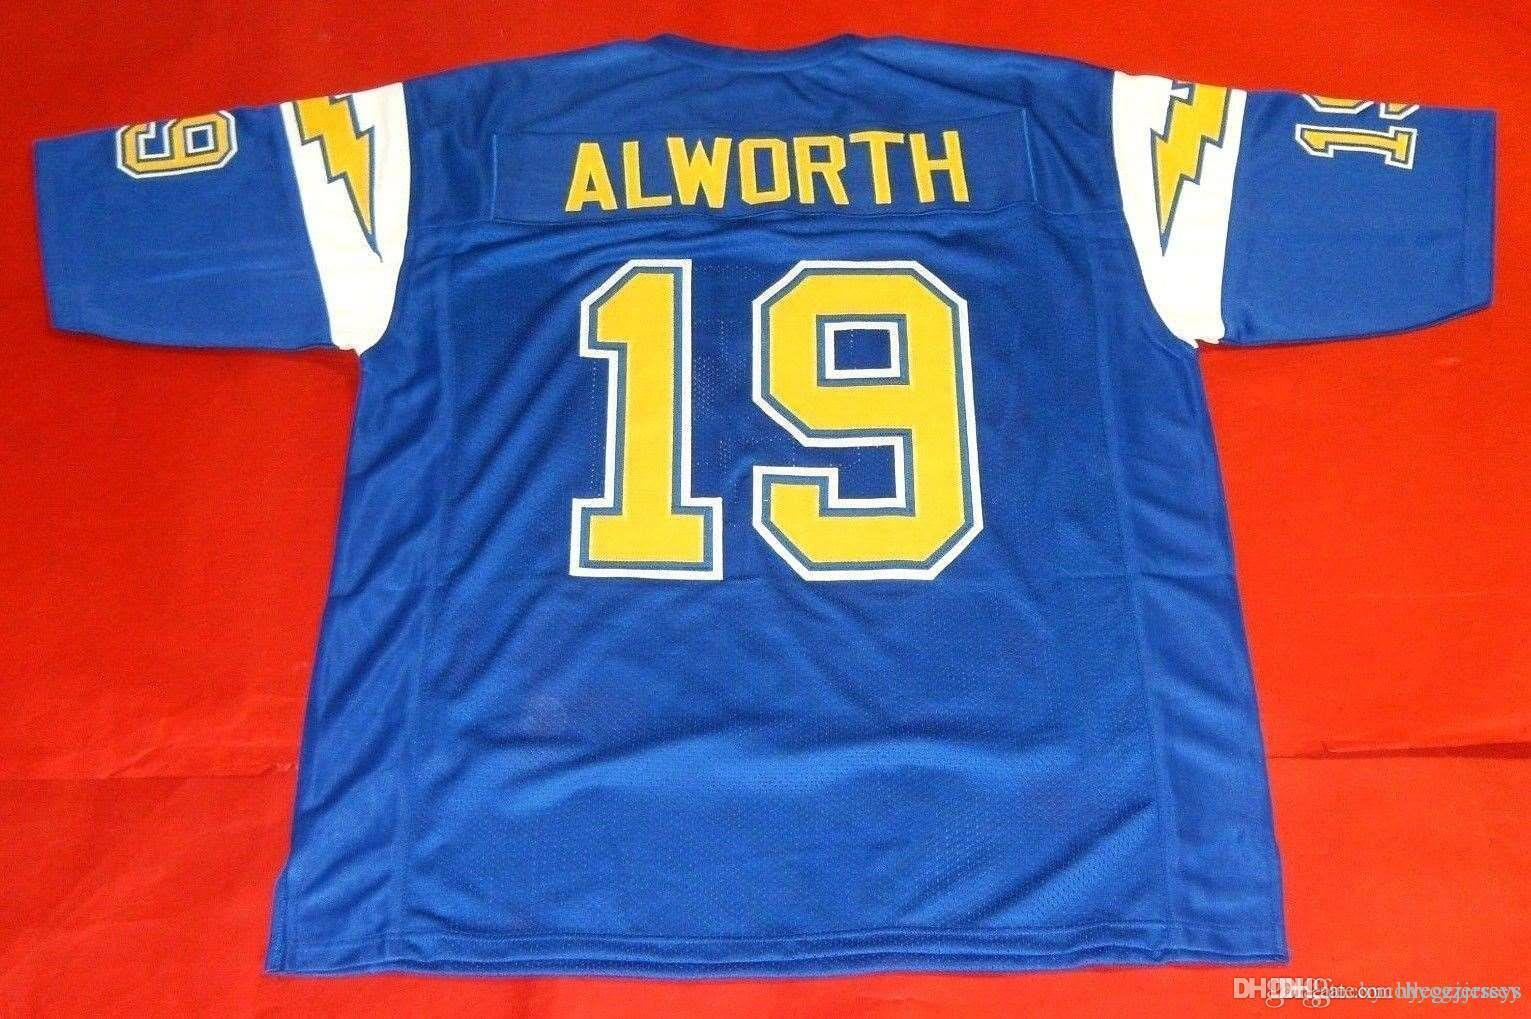 nbspNFL Retro # 19 Lance Alworth CUSTOM Top S-5XL, 6XL DB MITCHELL NESS Jersey Bule Herren Stitching Top S-5XL, 6XL Fußballjerseys Lauf